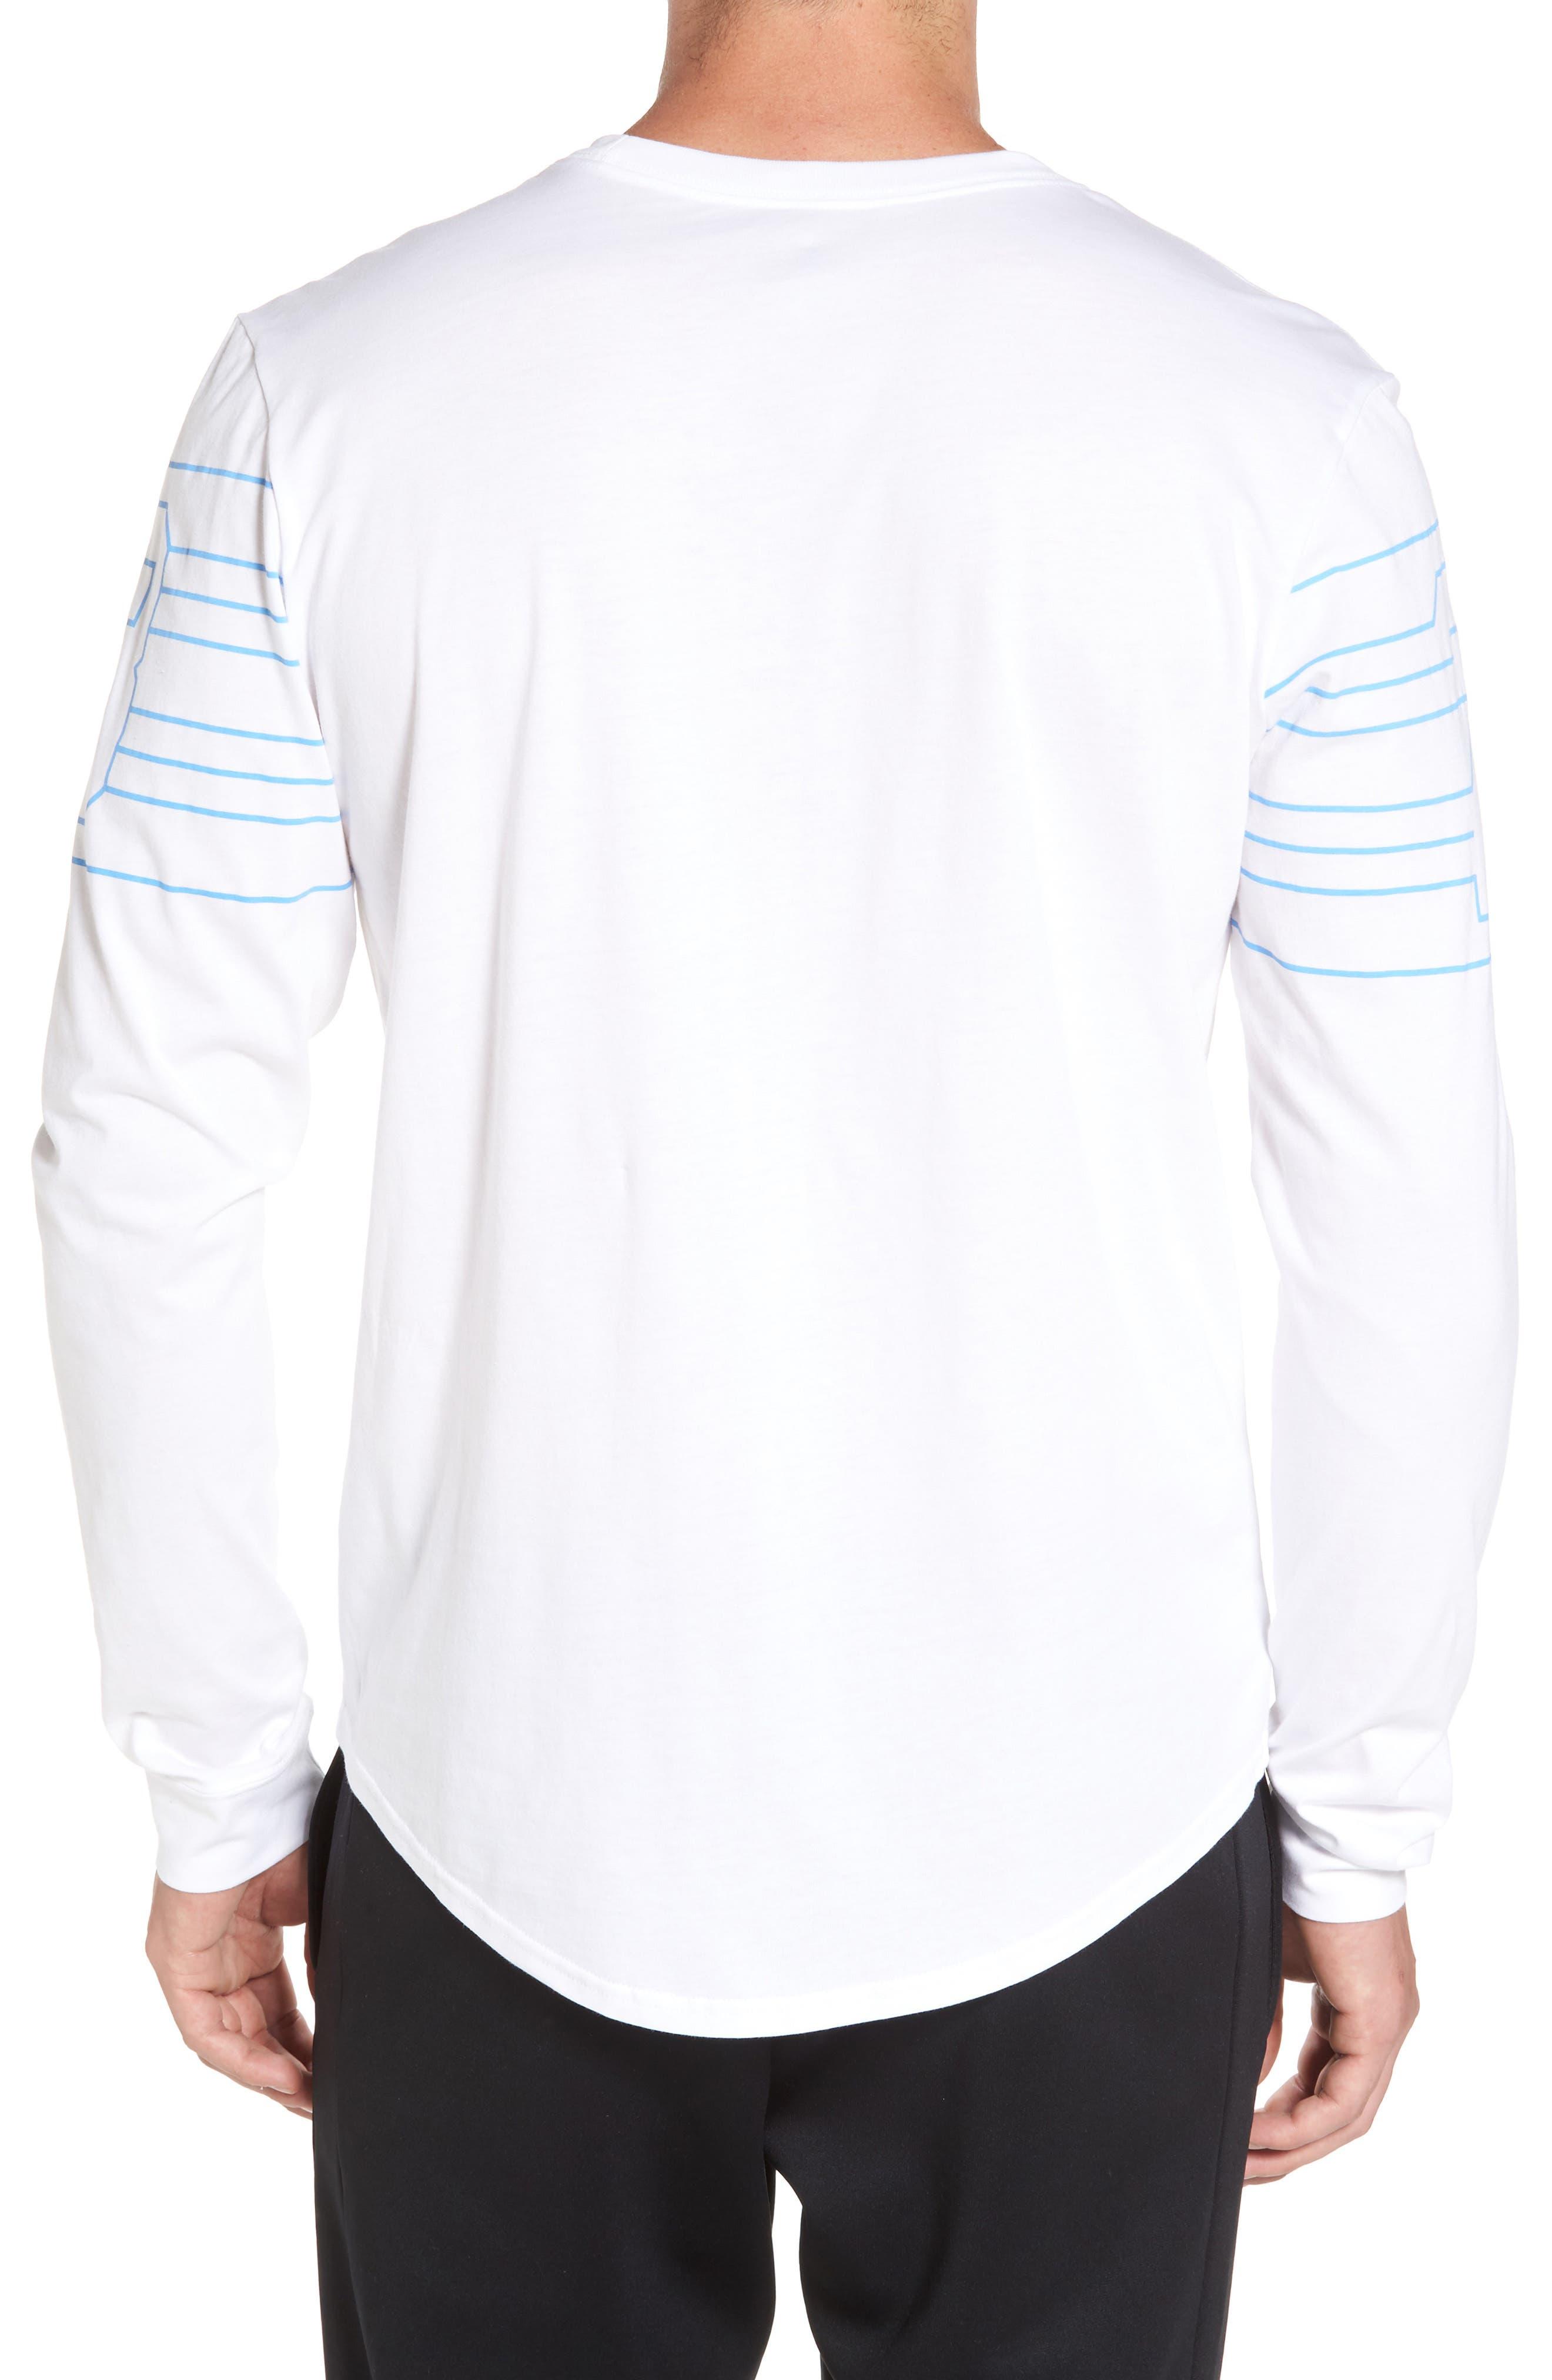 Sportswear 23 T-Shirt,                             Alternate thumbnail 4, color,